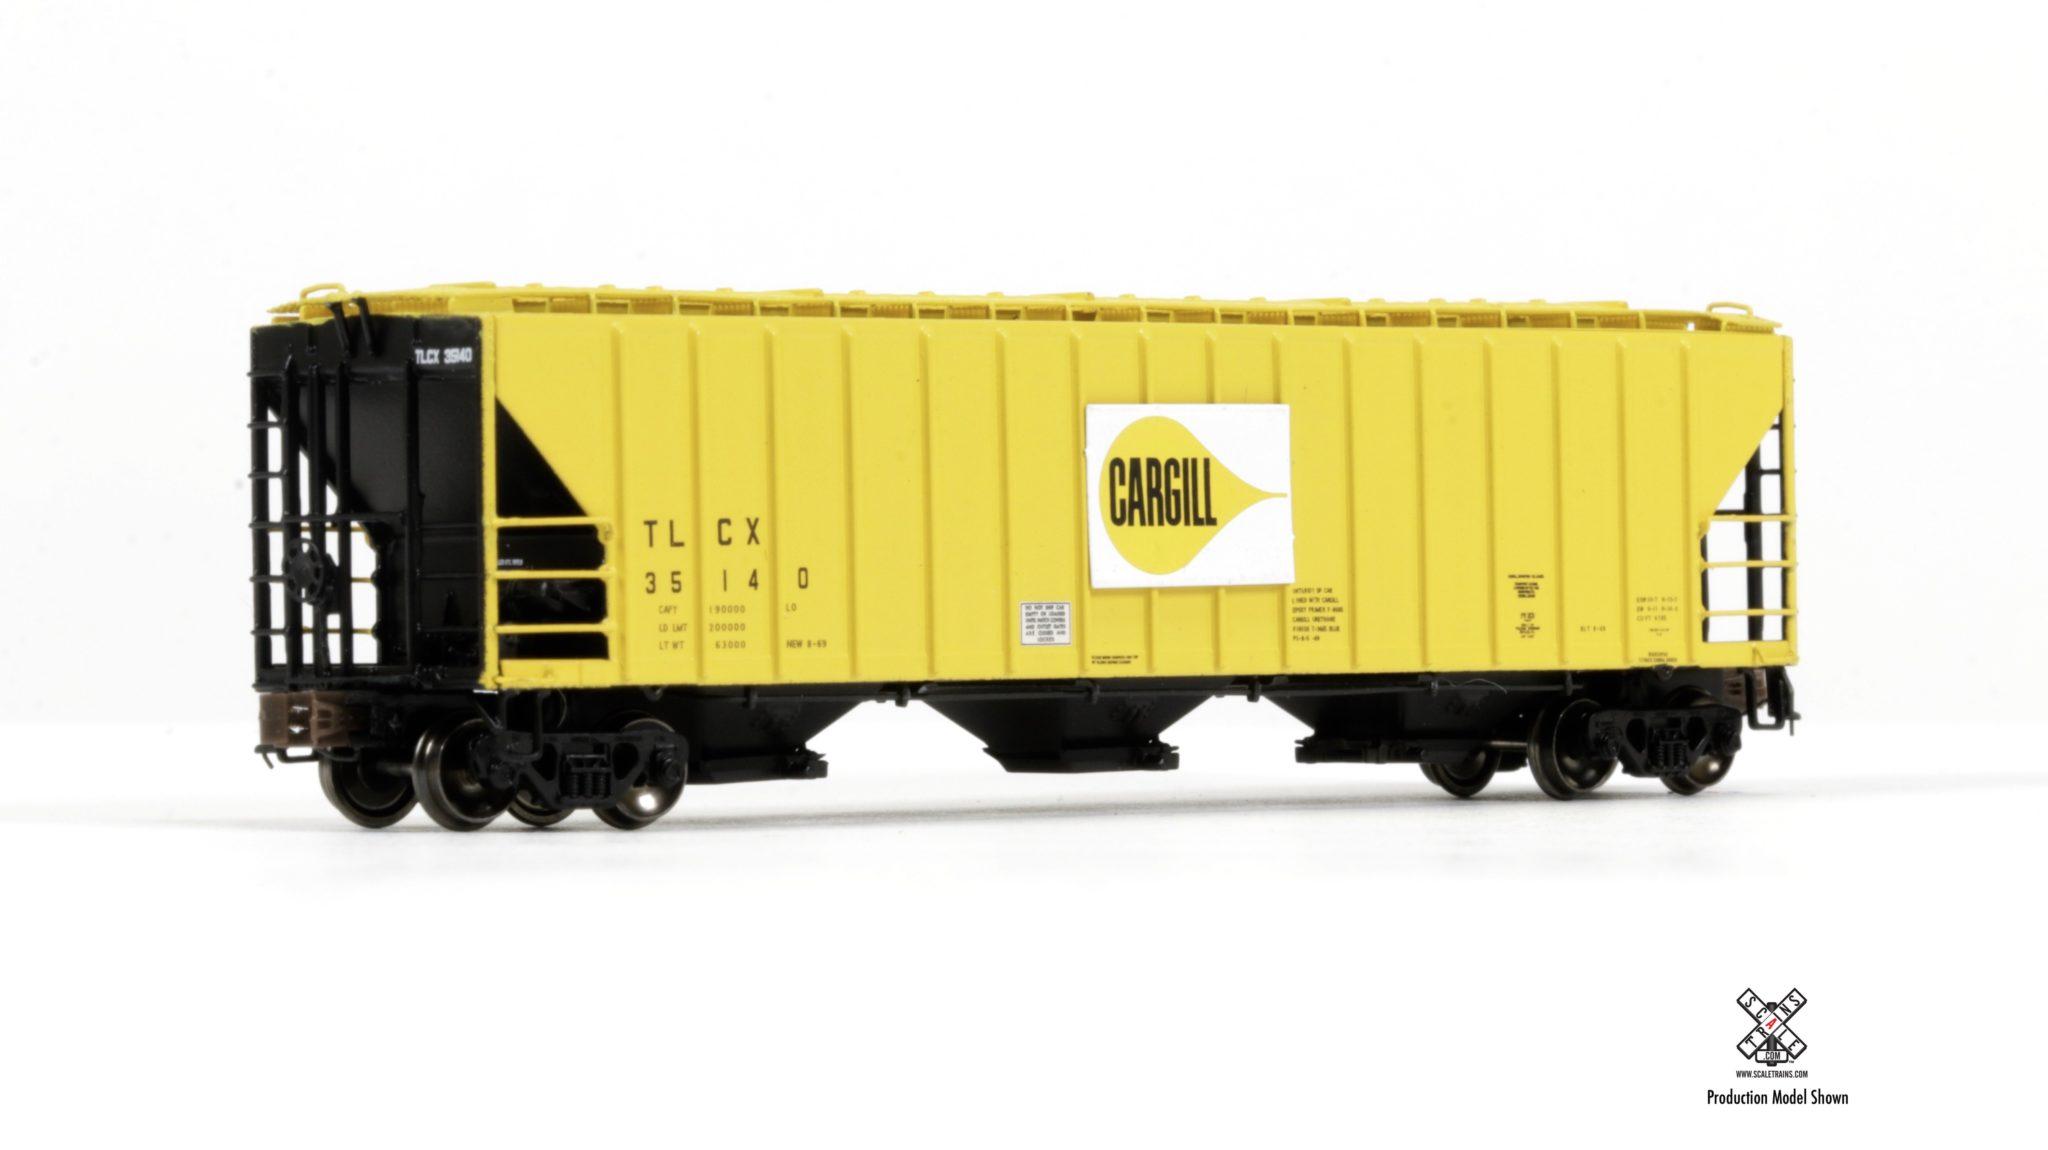 N Scale - ScaleTrains.com - SXT31047 - Covered Hopper, 3-Bay, PS-2 - Cargill - 35142